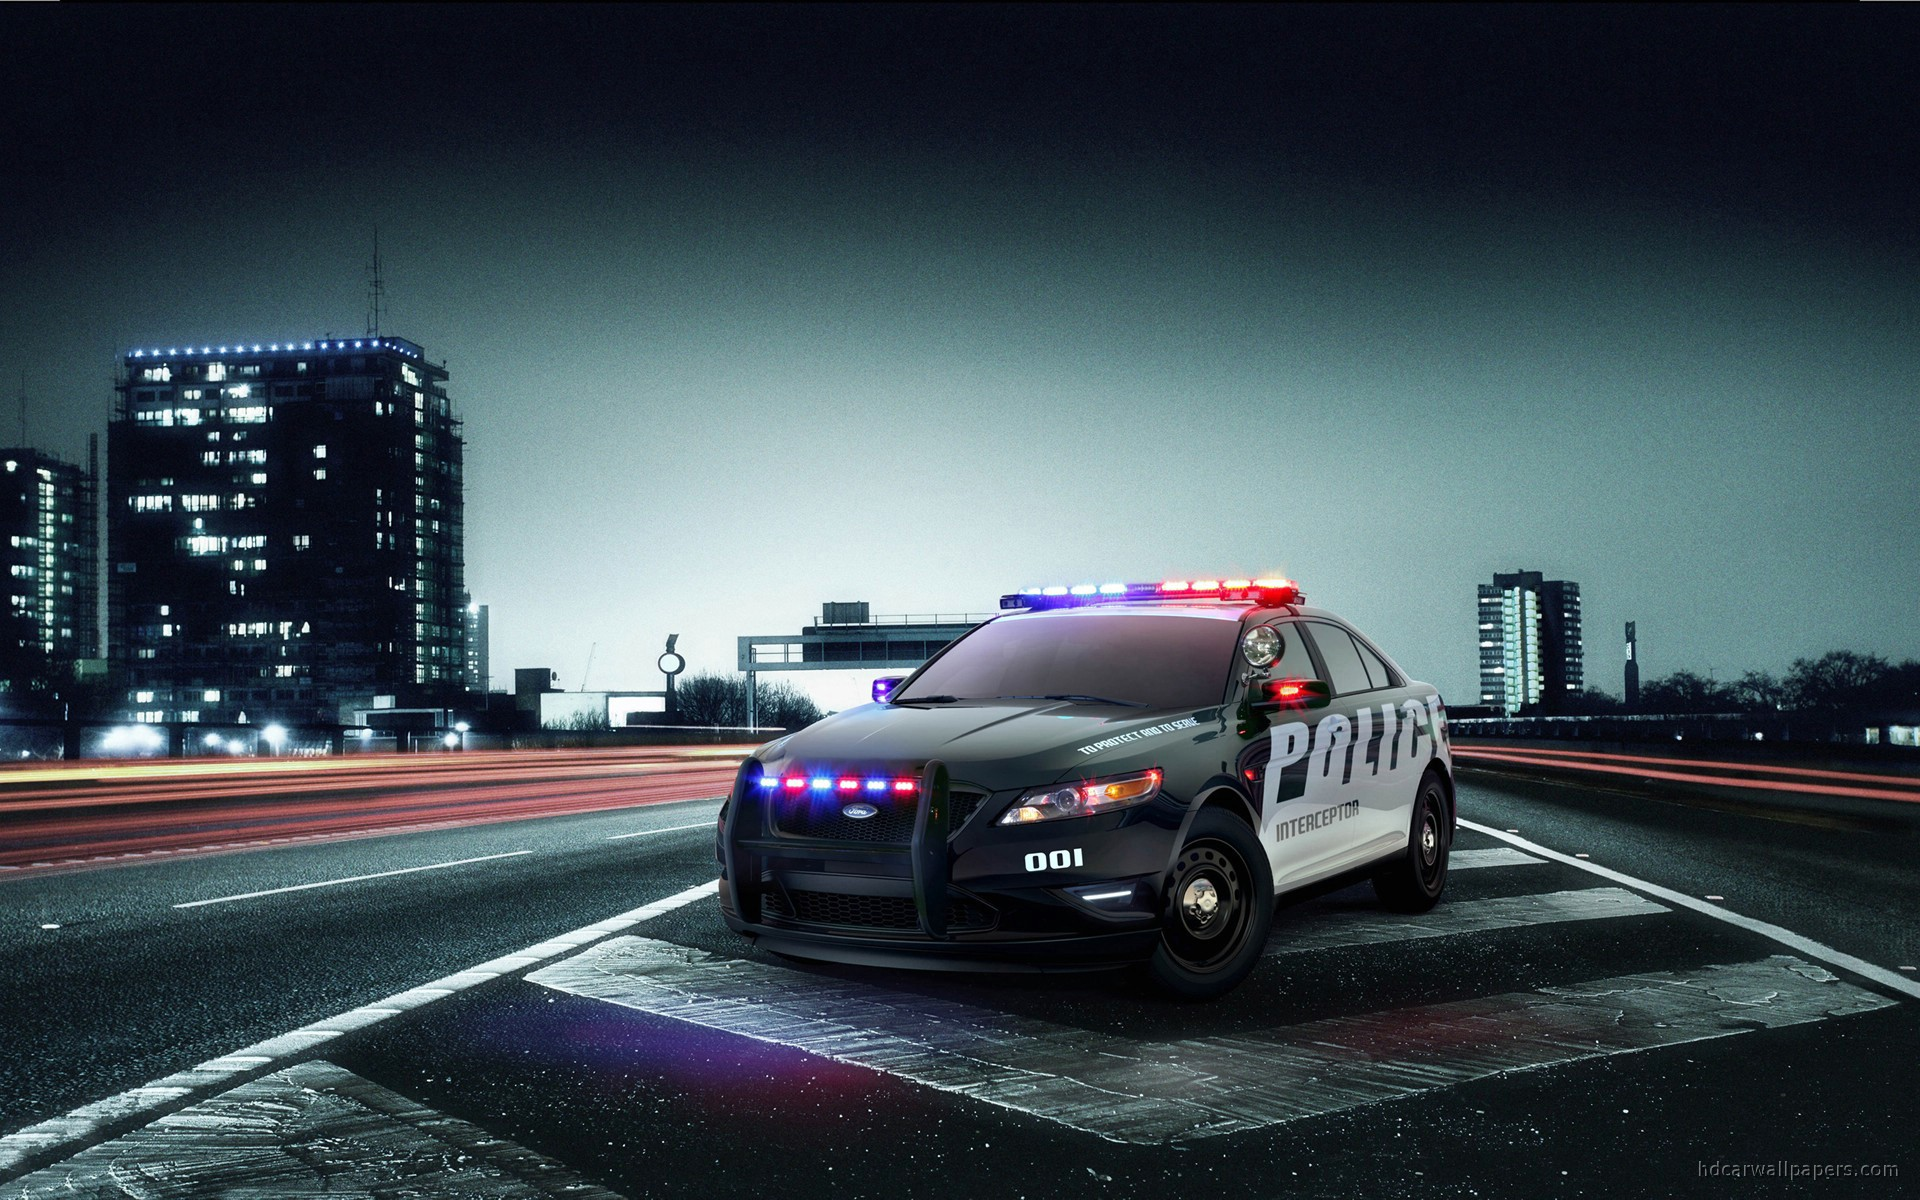 Ford Police Interceptor Wallpaper Hd Car Wallpapers Id 685